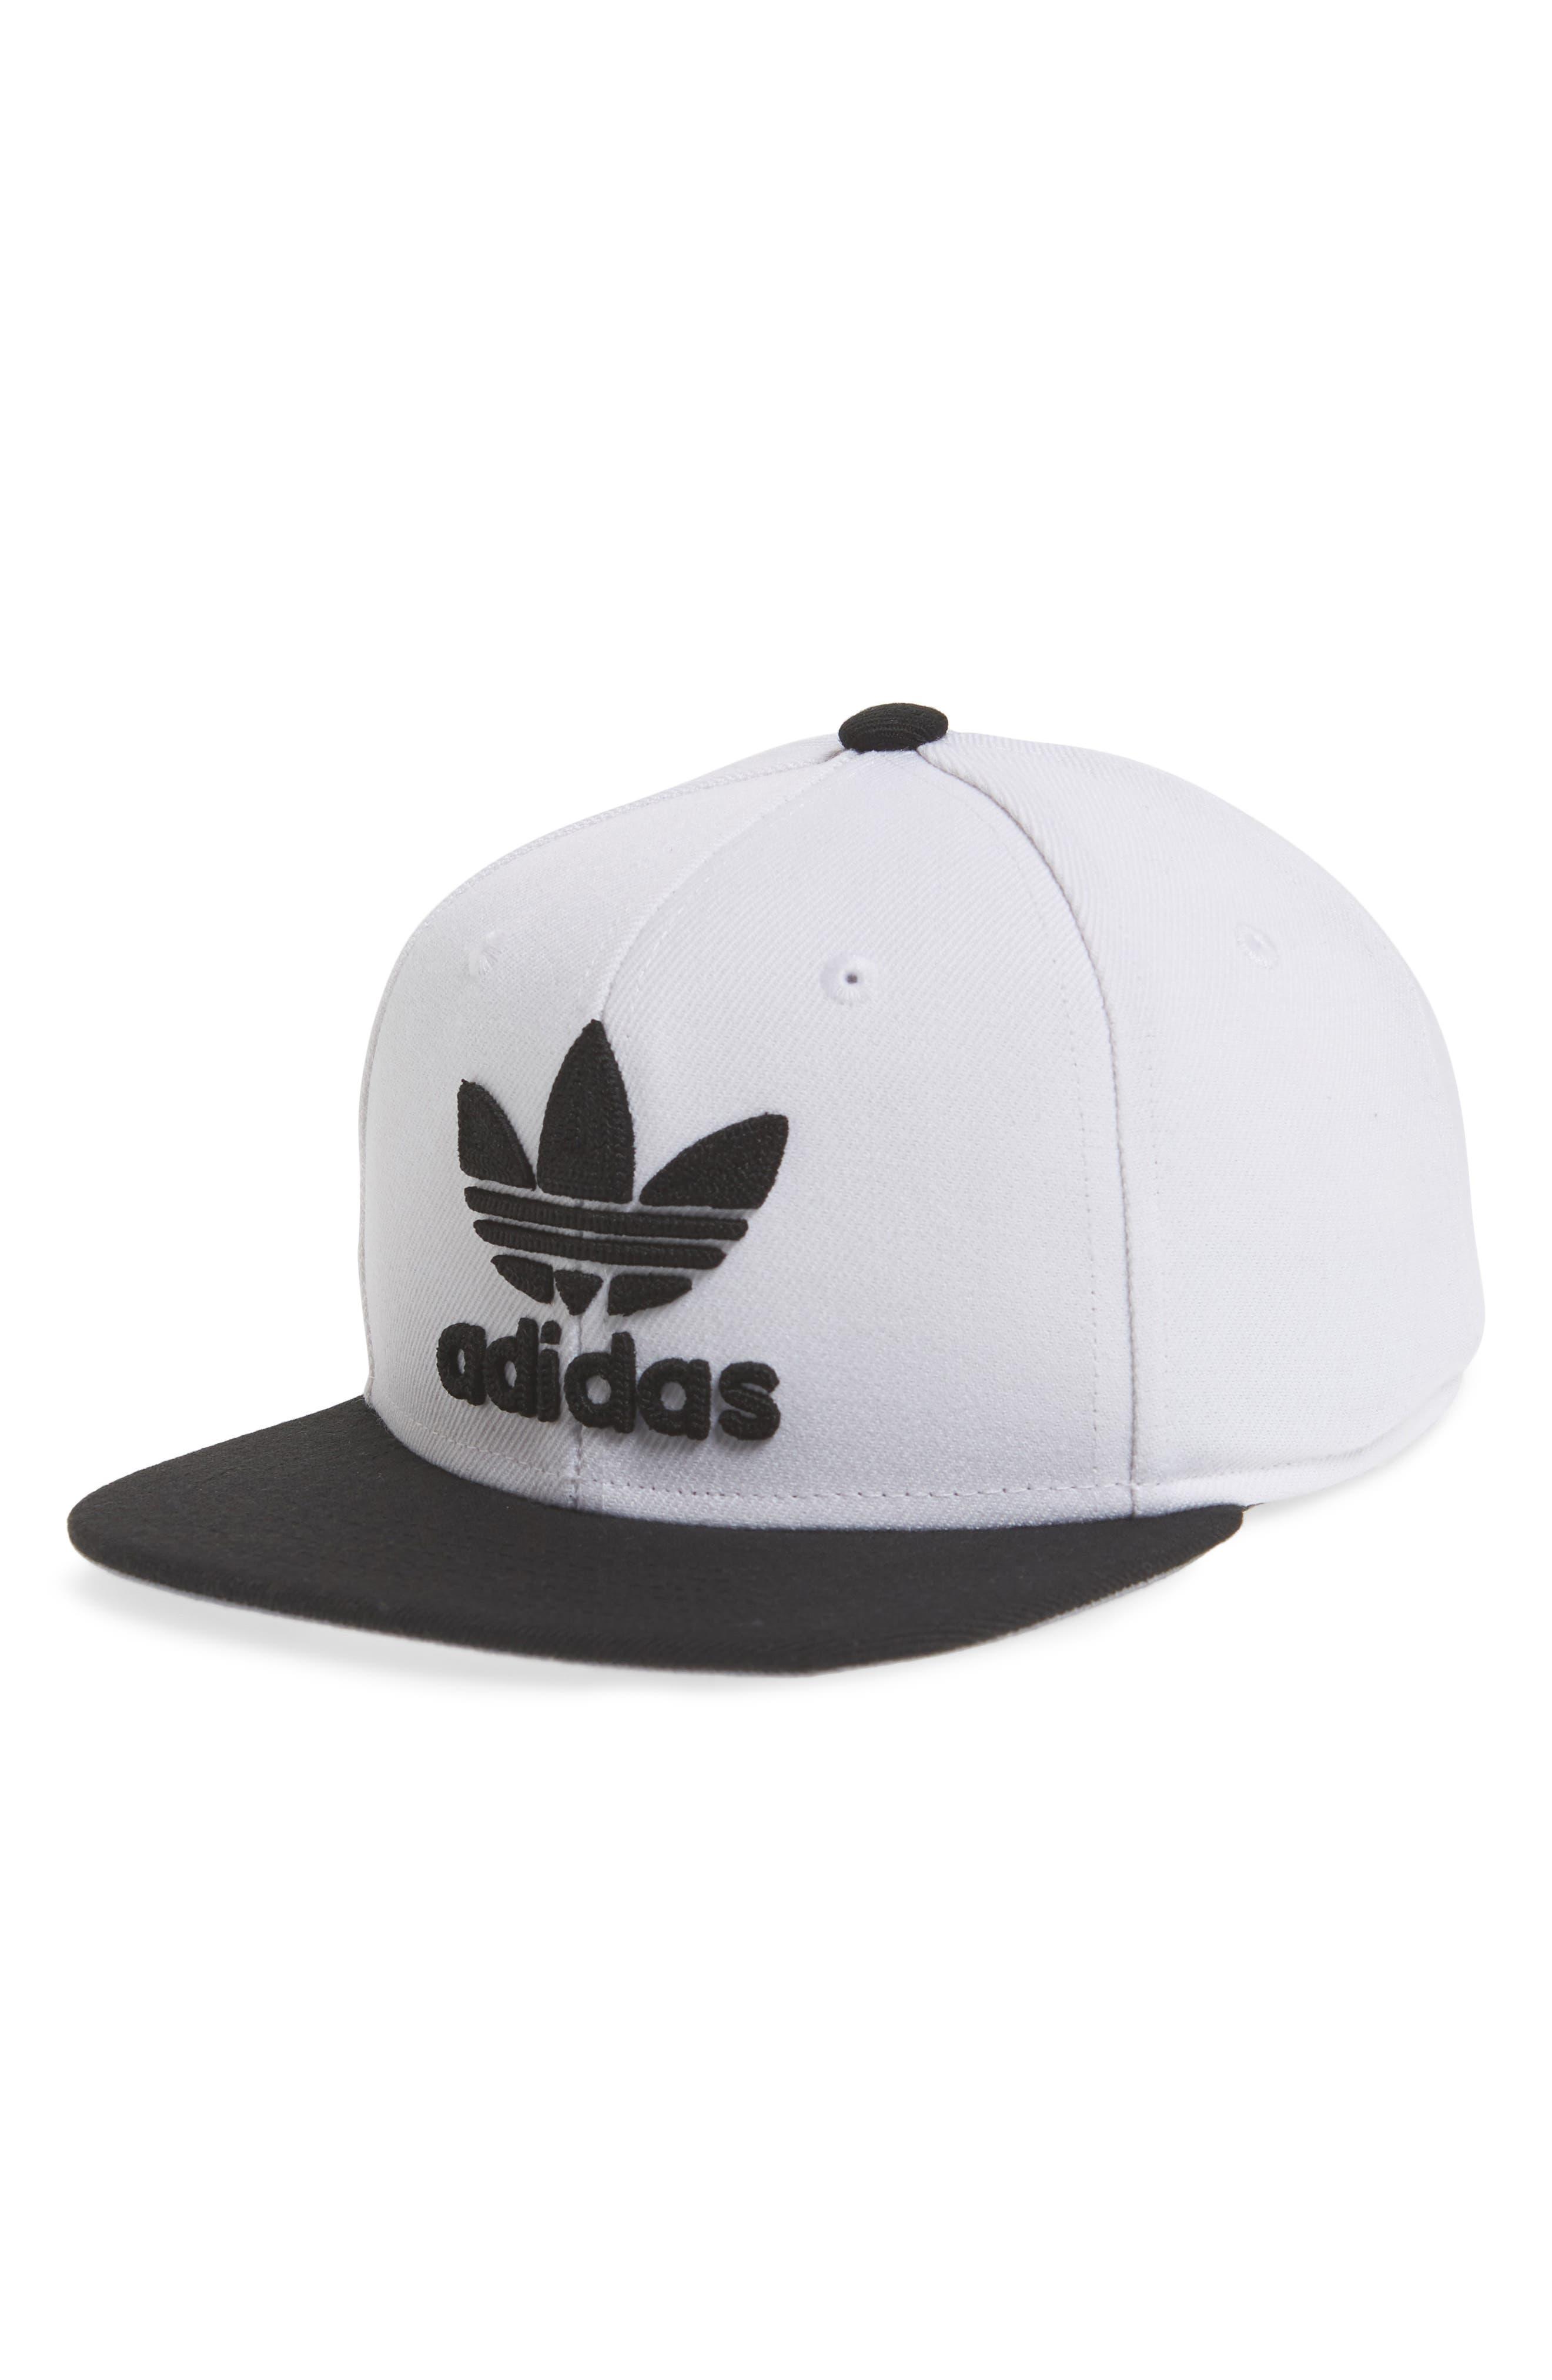 Boys Adidas Originals Snapback Hat  White